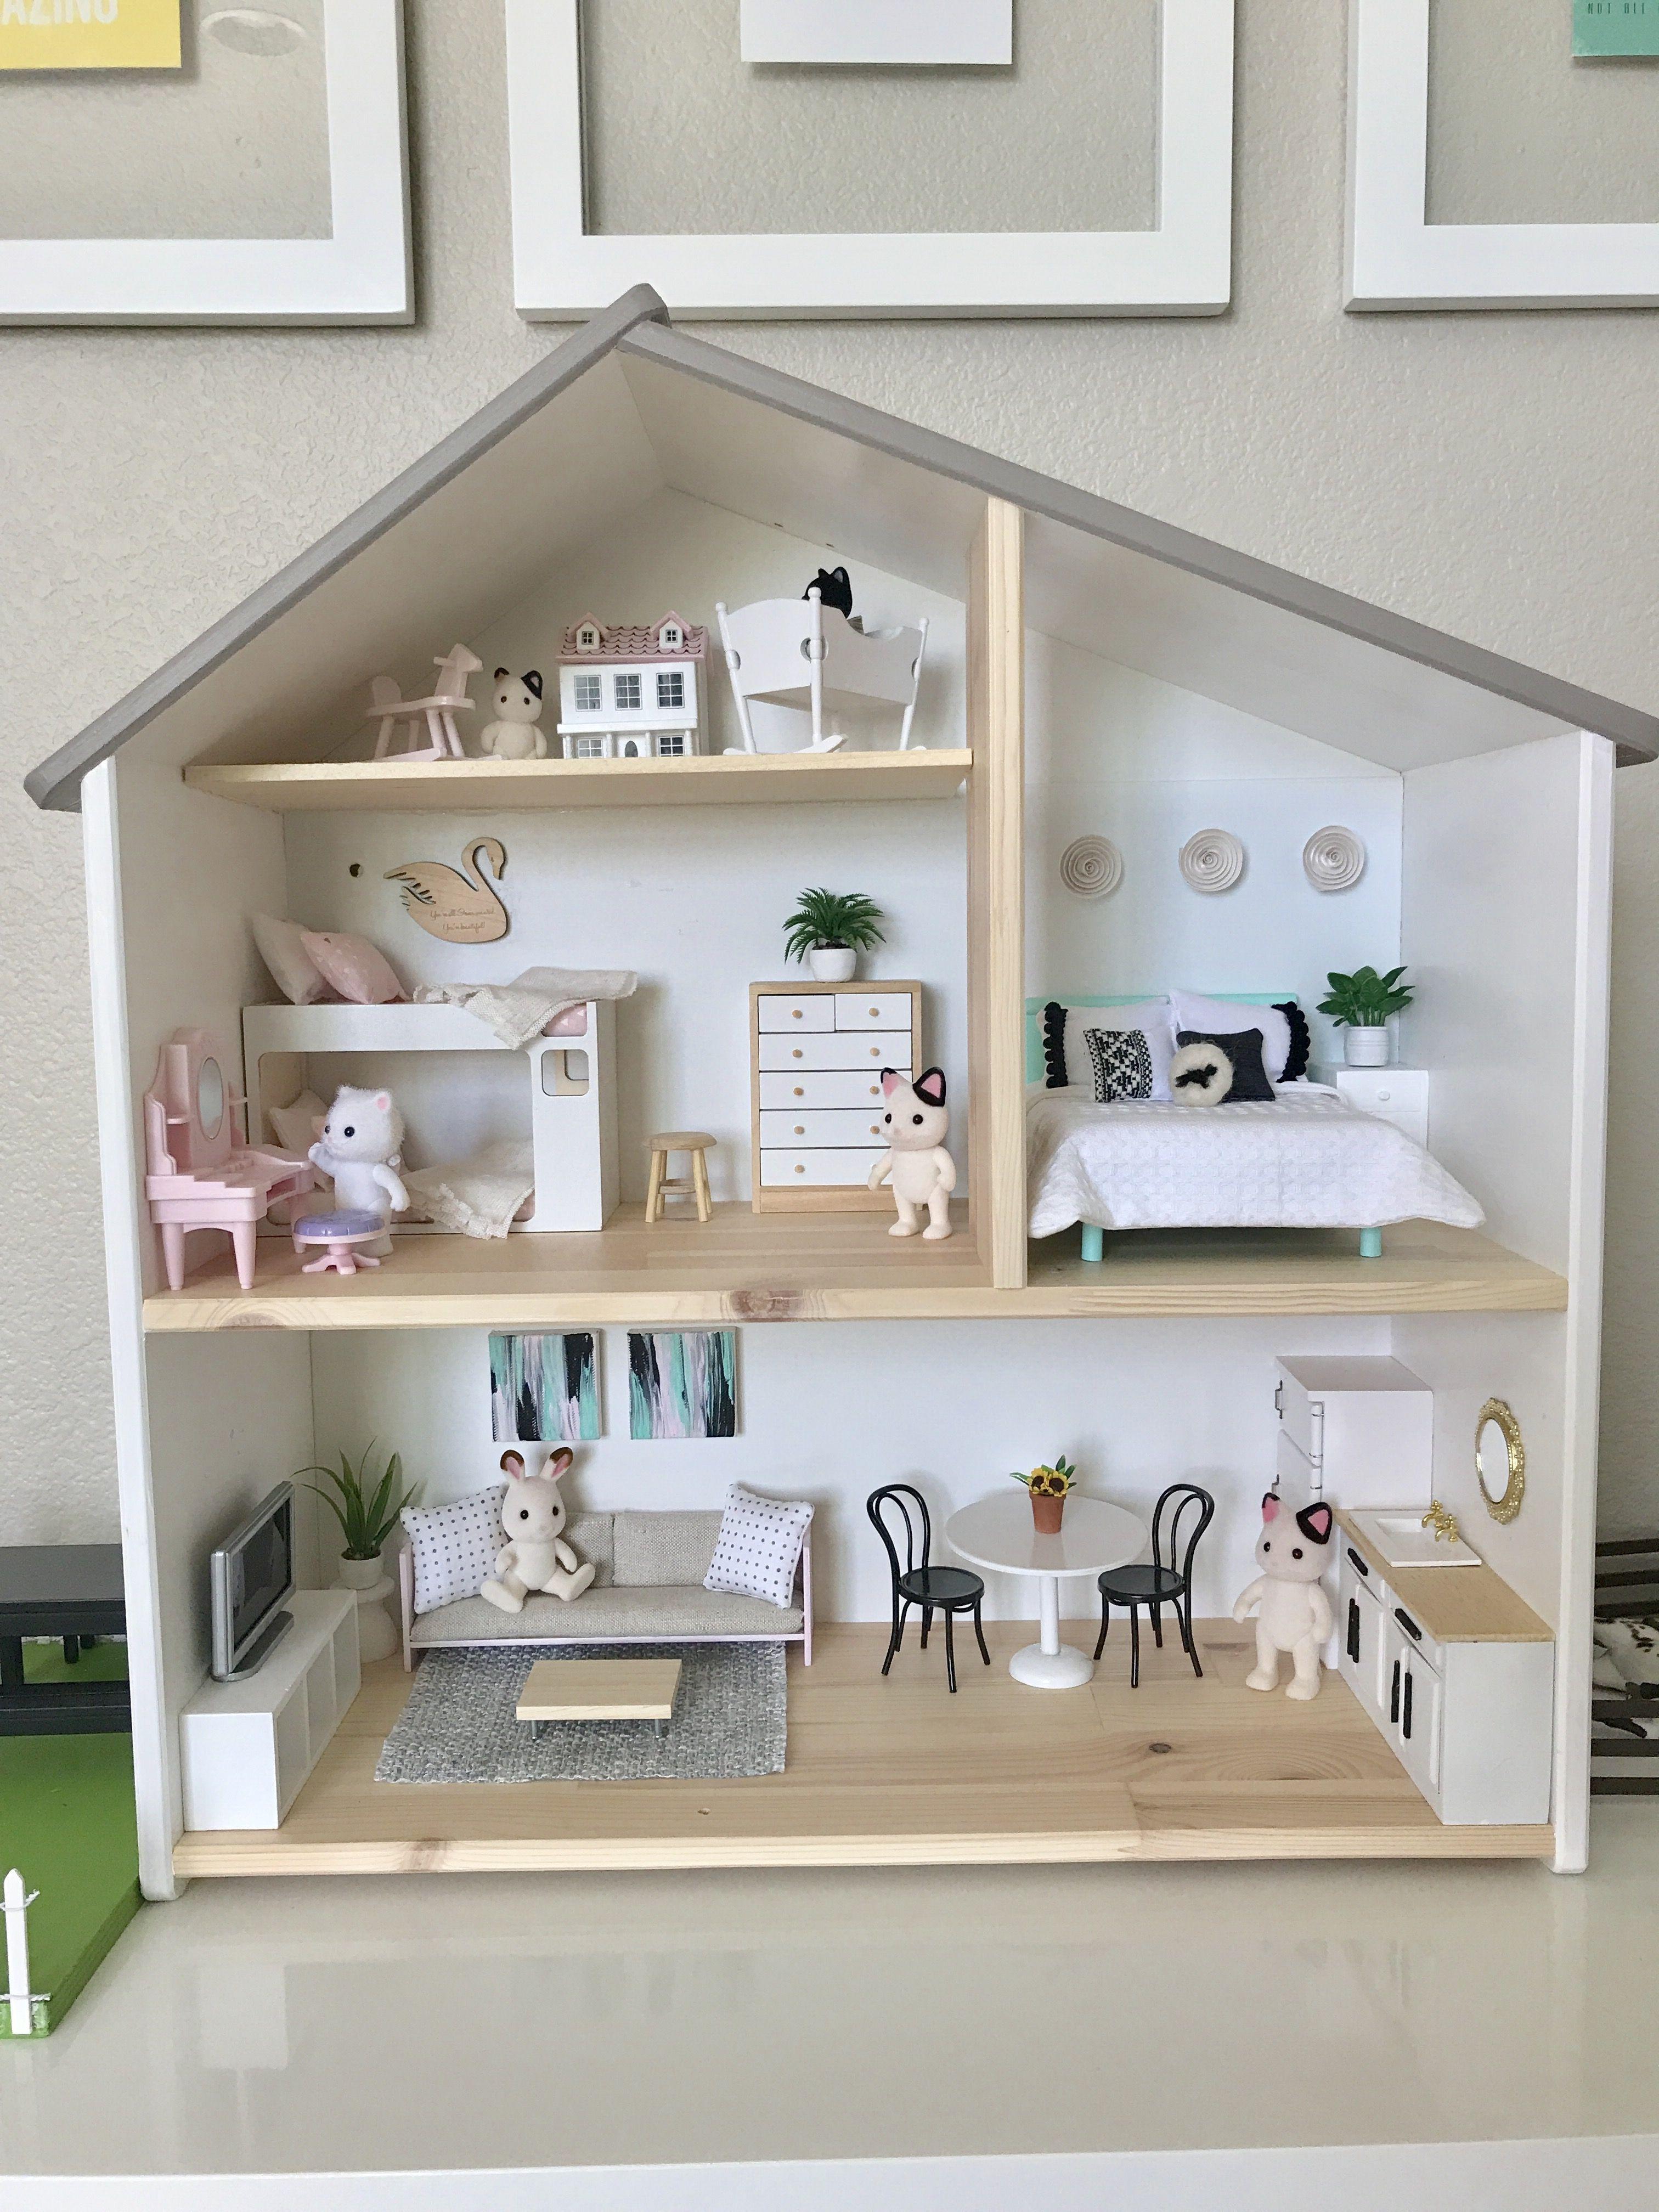 ikea miniature furniture. Brilliant Miniature Image Result For Ikea Flisat Dollhouse To Ikea Miniature Furniture